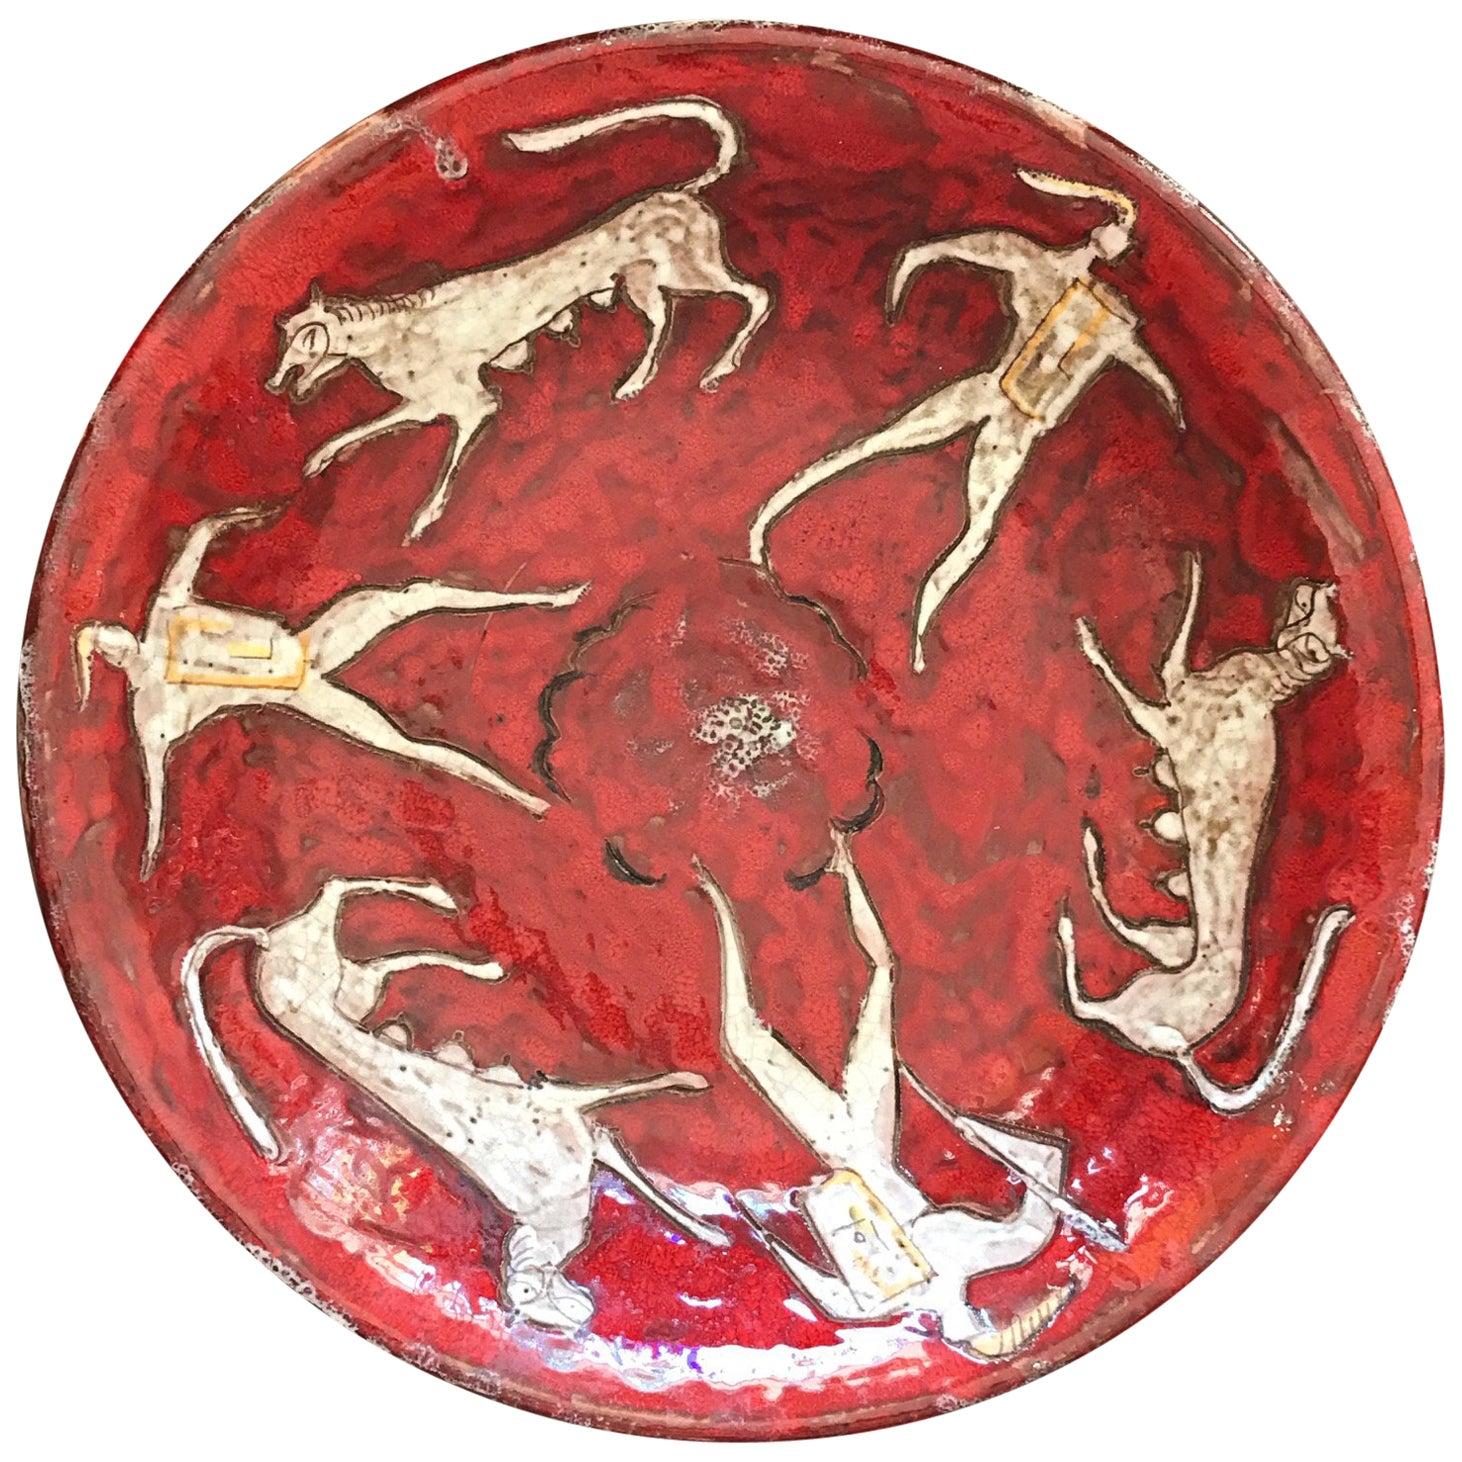 Eugenio Pattarino Ceramic Charger